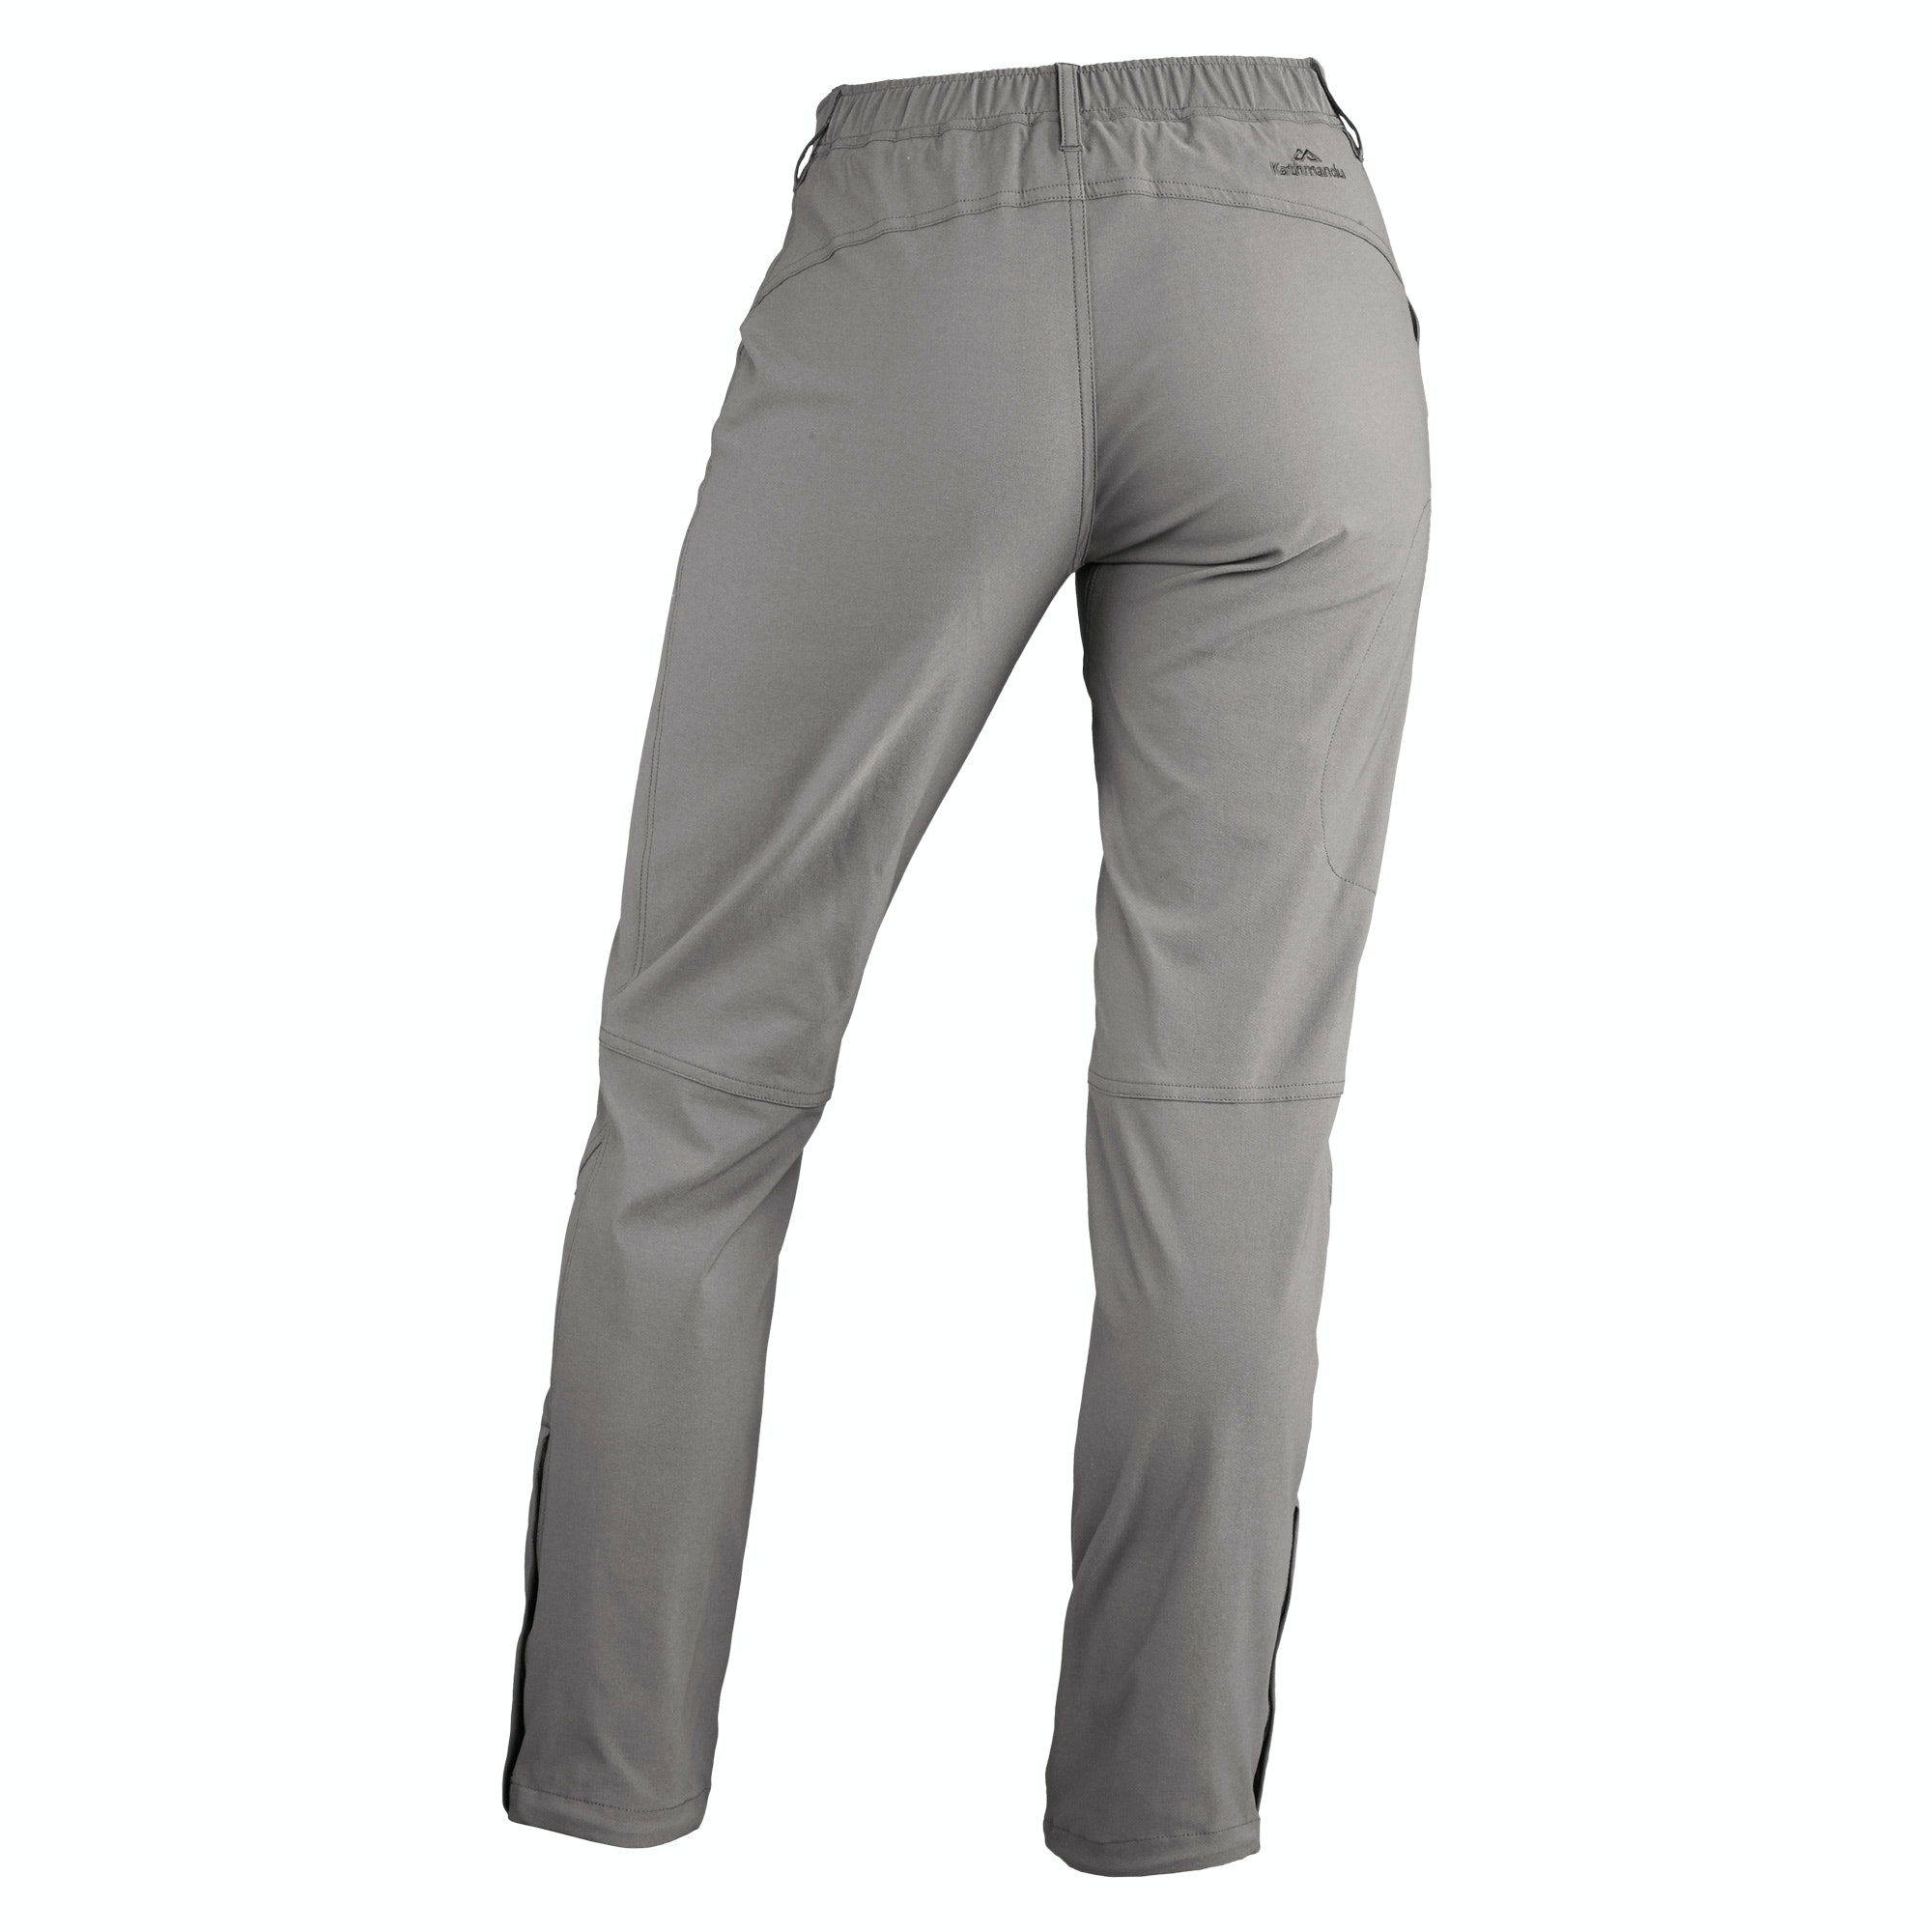 NEW-Kathmandu-Eris-Women-039-s-Softshell-Hiking-Pants-Trousers-v2-Zip-Hem-Over-Boots thumbnail 11